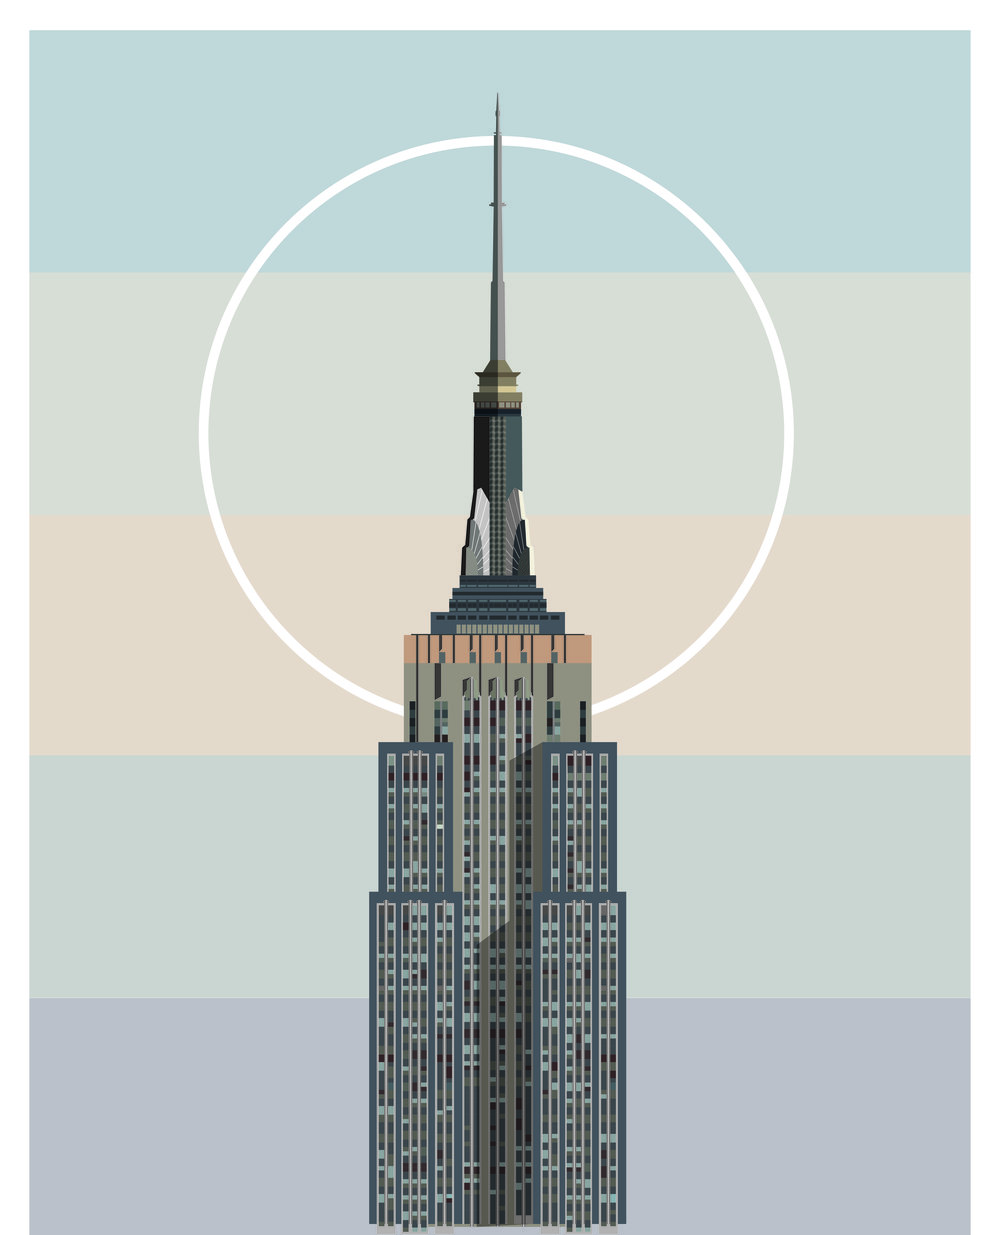 Empire_State_Building_v06-02.jpg